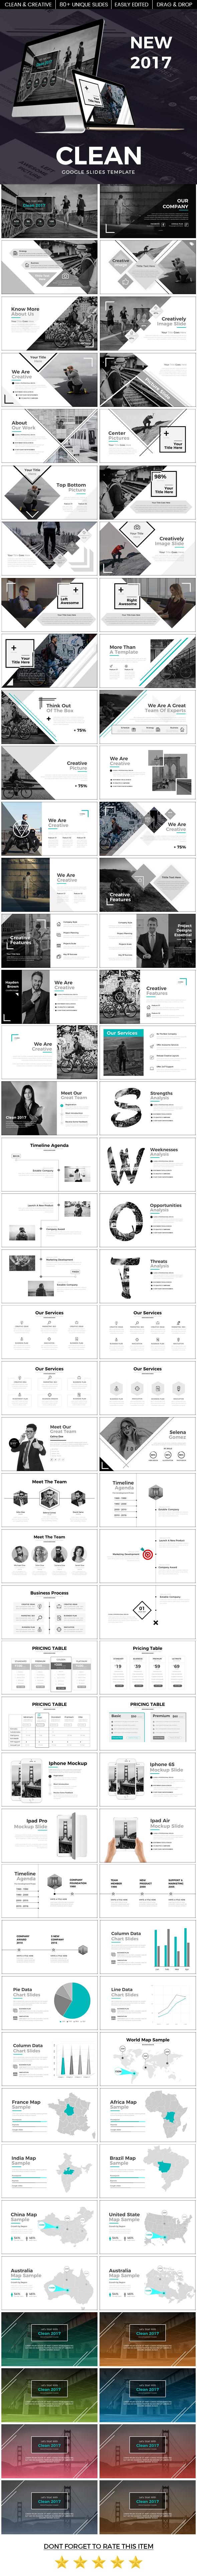 Clean 2017 Google Slide Template